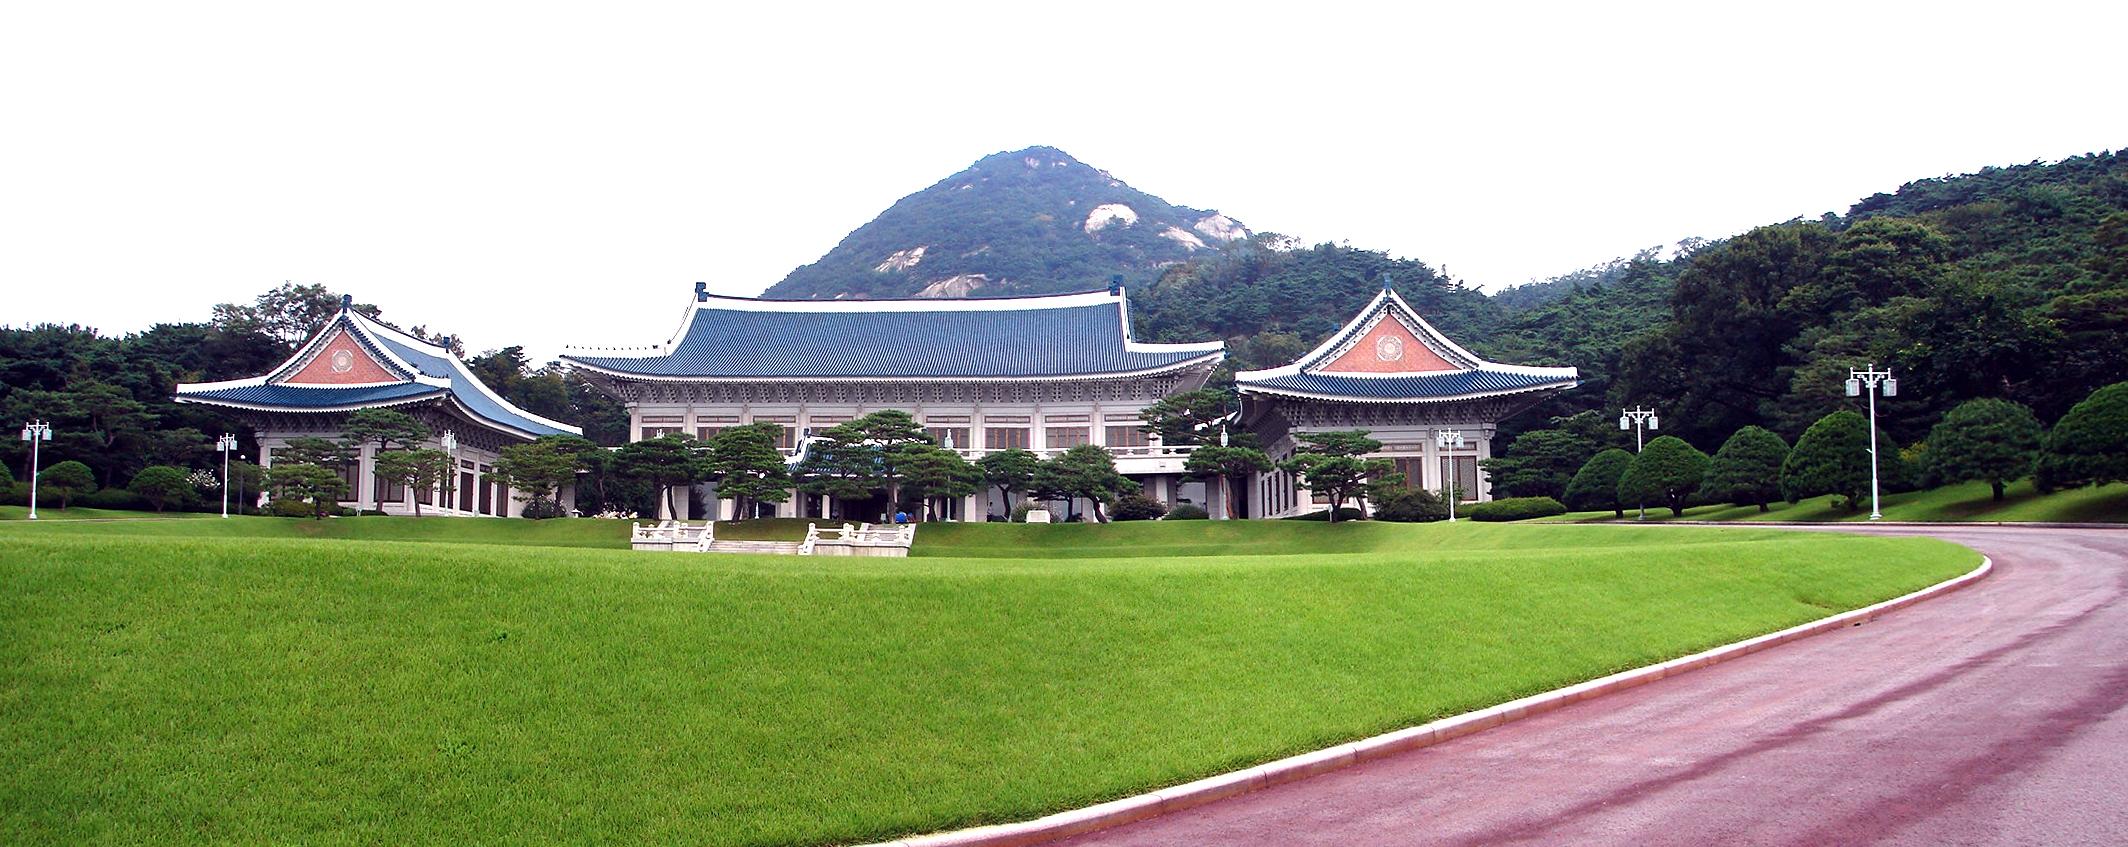 Korea-Seoul-Blue House (Cheongwadae) Reception Center 0688&9-07.jpg